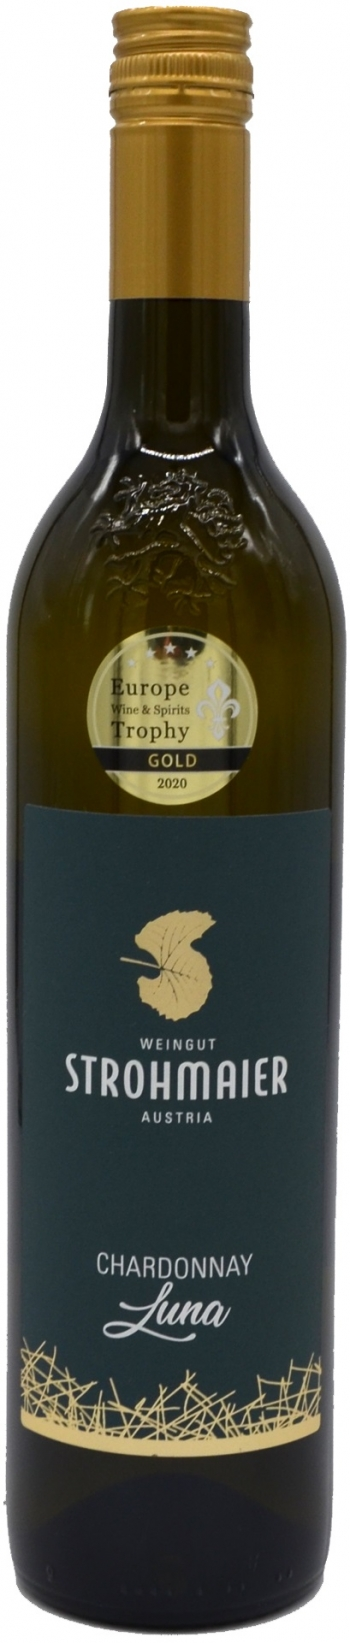 Luna Chardonnay, Strohmaier 2020